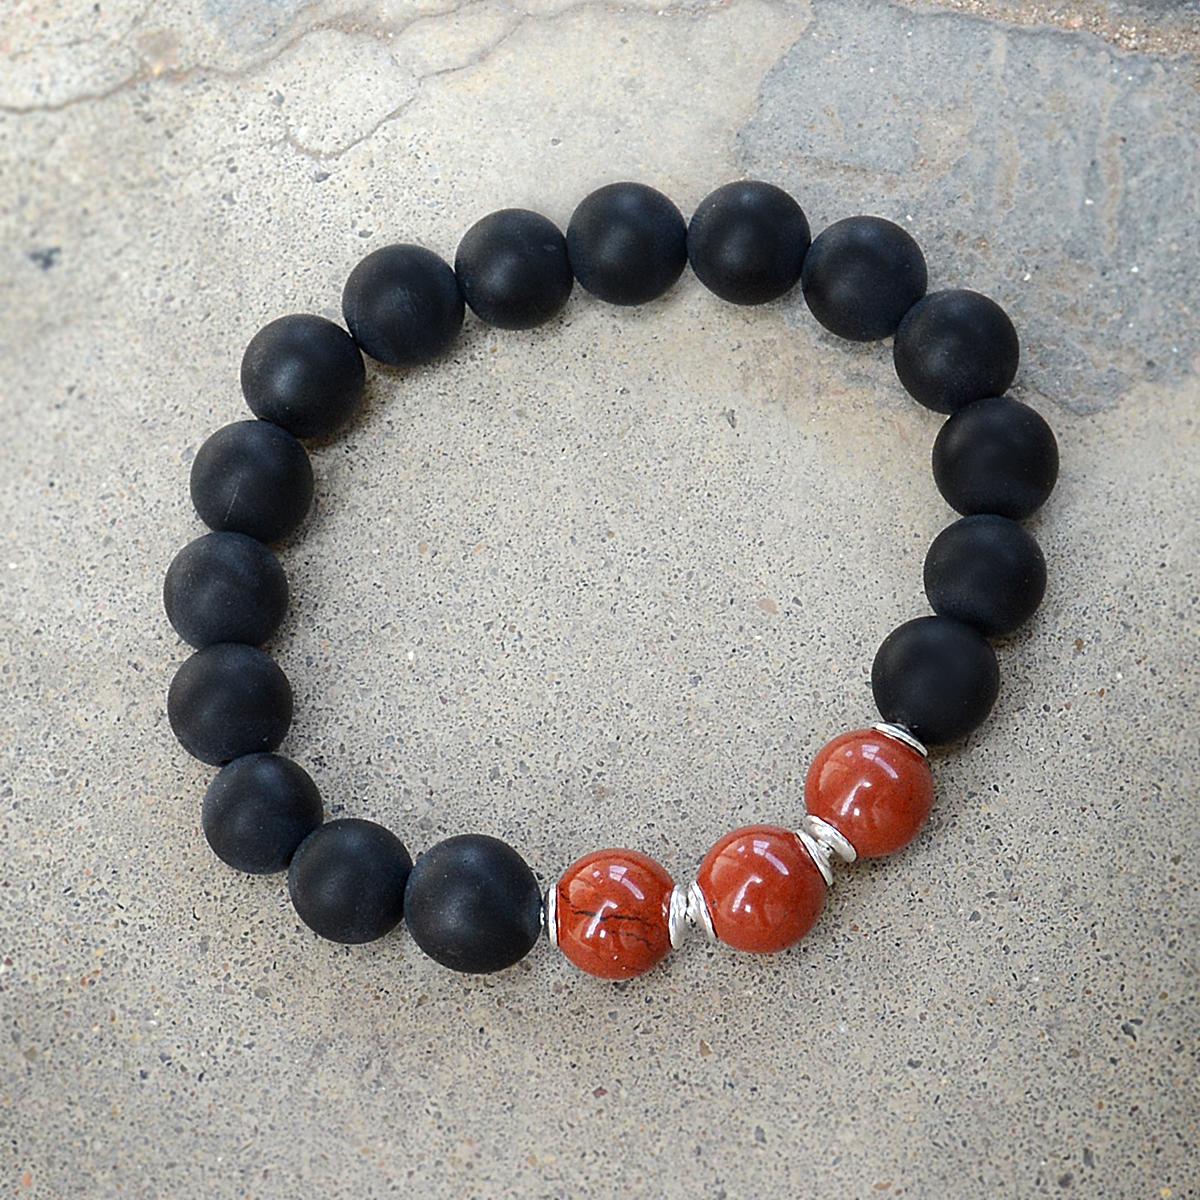 10mm Beads Handmade Jewelry Manufacturer Matte Onyx & Red Jasper 925 Sterling Silver Jaipur Rajasthan India Stretch Bracelet